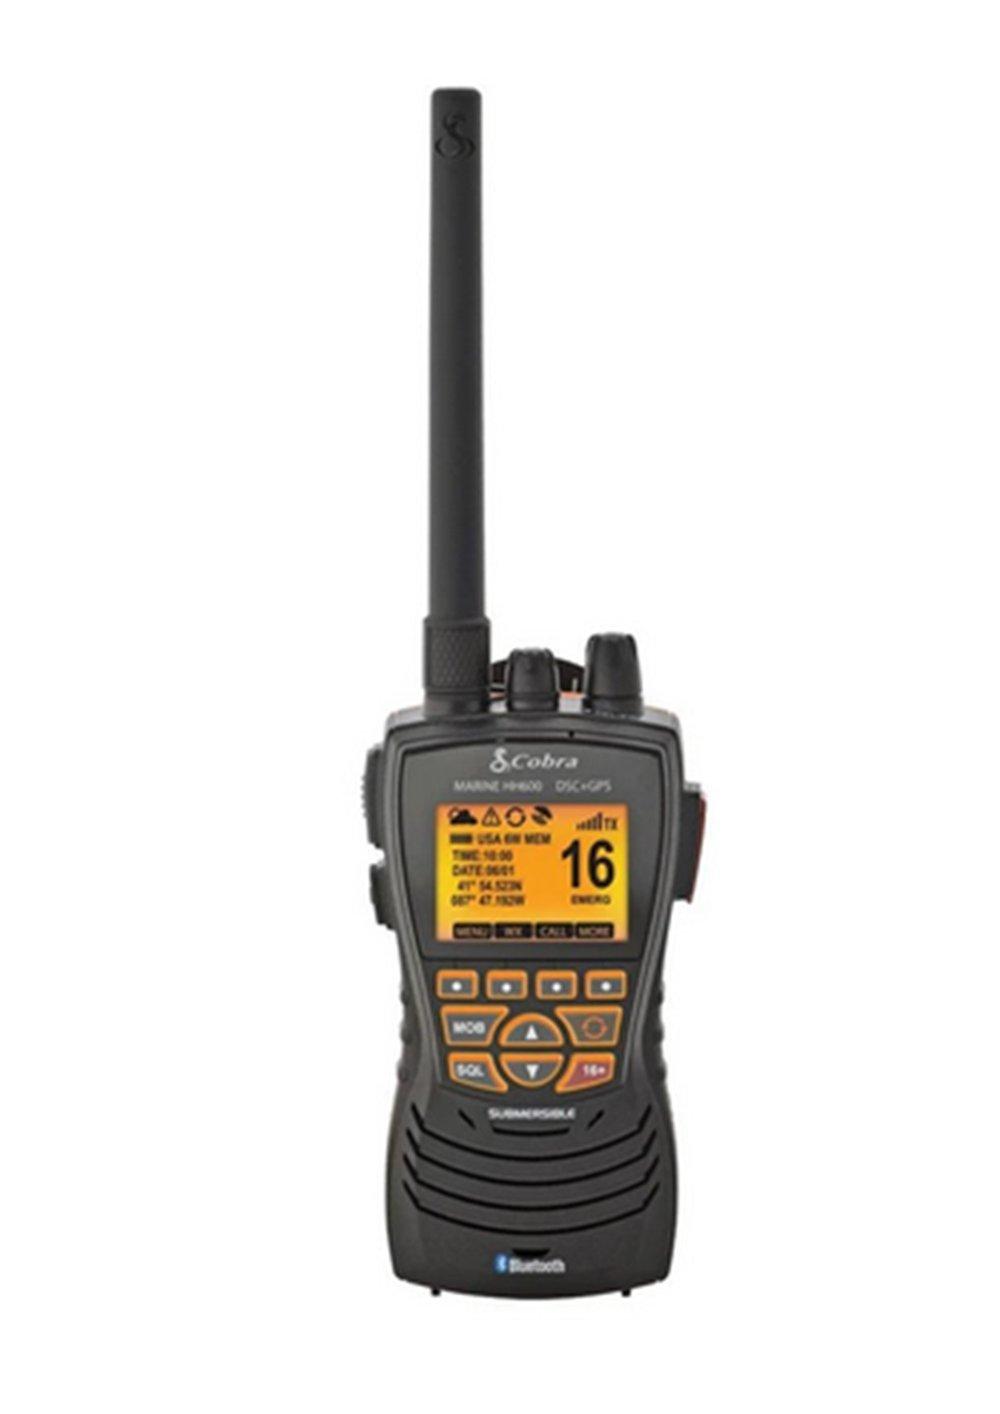 COBRA HH600E Handheld VHF/DSC Radio with GPS.   (10% Discount off RRP)